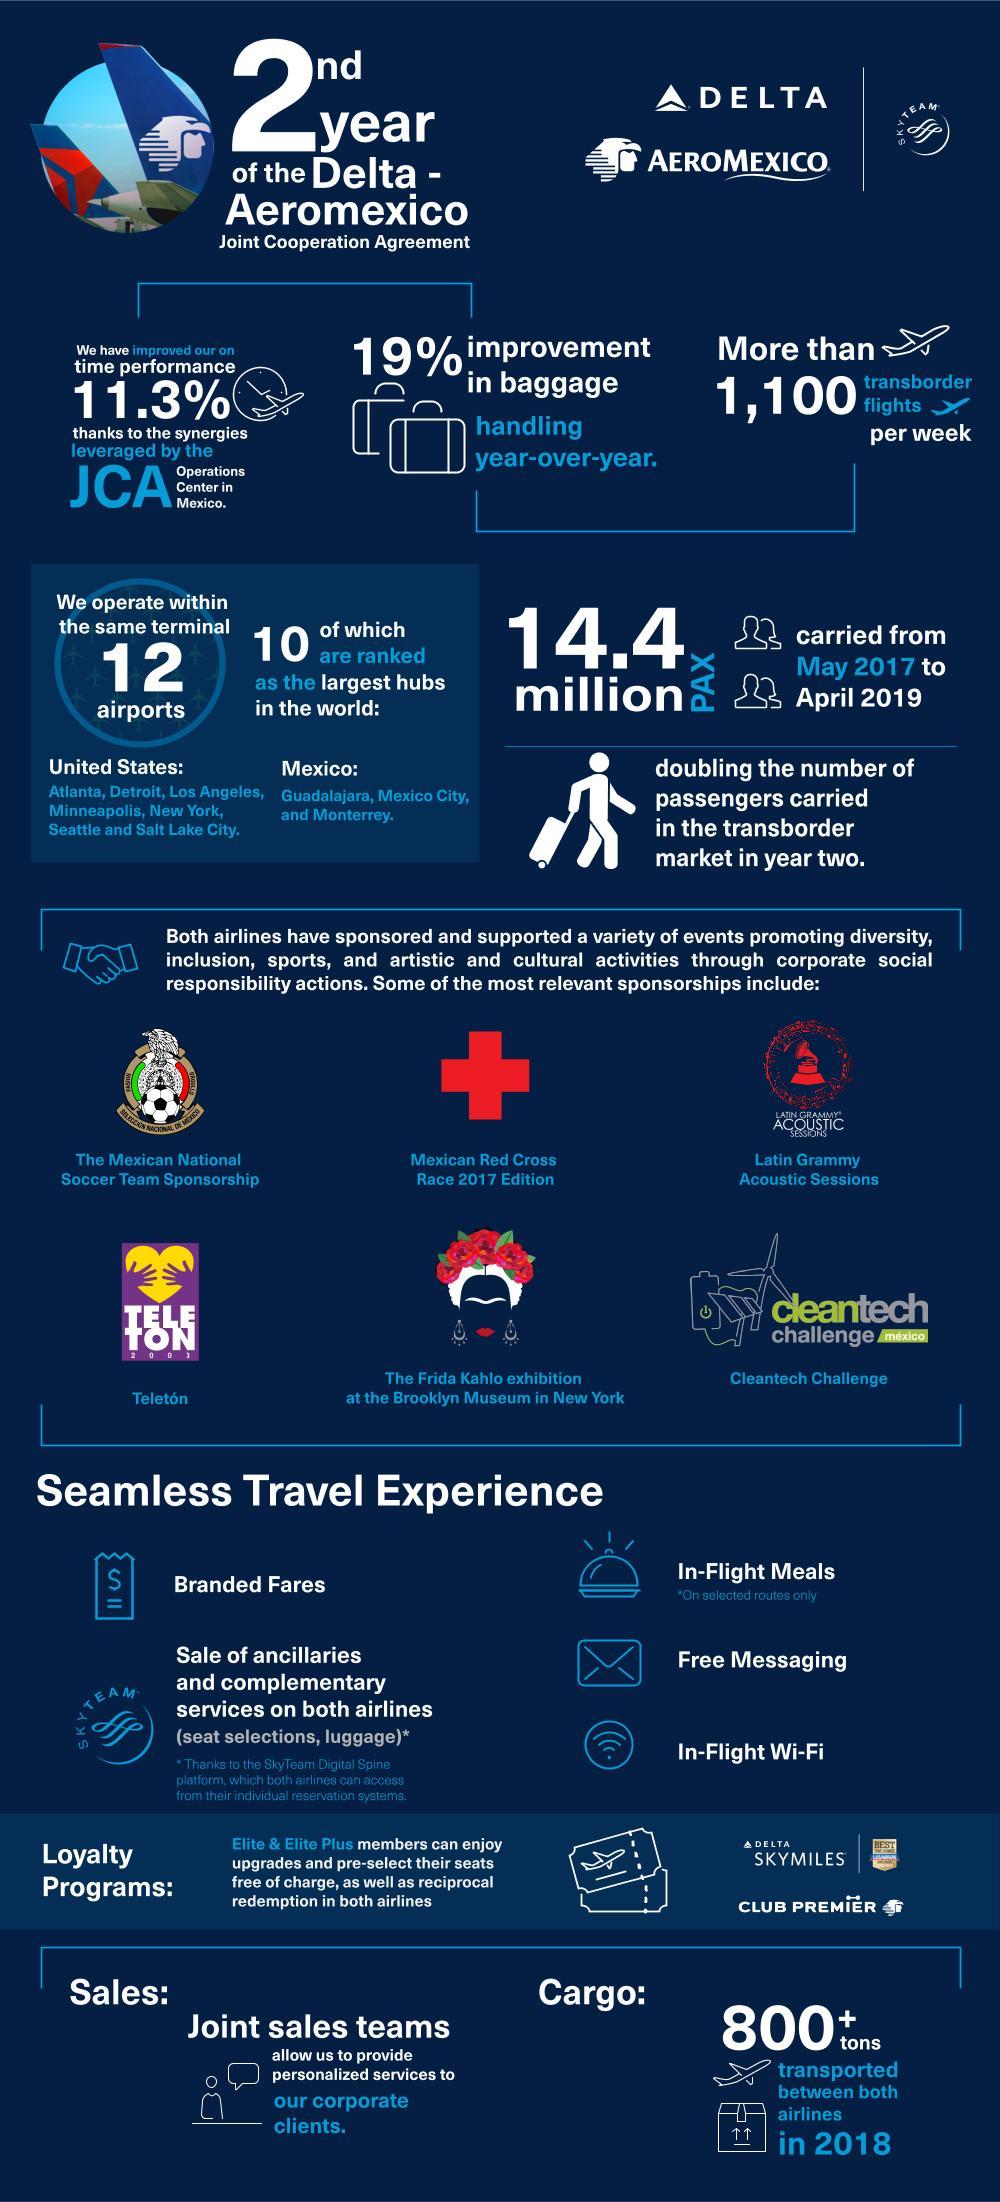 Delta Aeromexico year 2 infographic